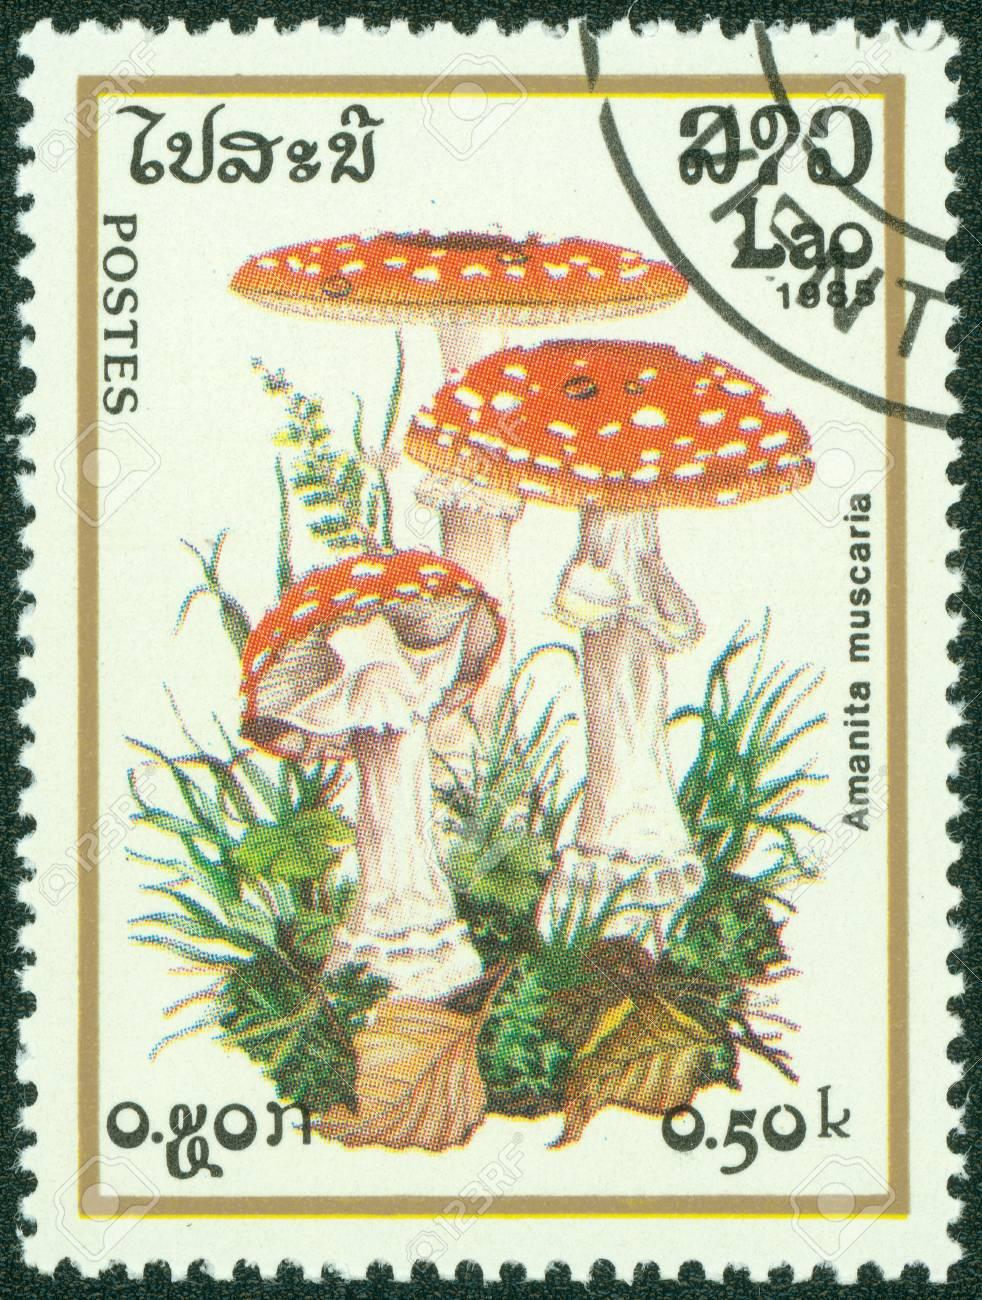 LAOS- CIRCA 1985  A stamp printed in LAOS, shows Poisonous mushroom, circa 1985 Stock Photo - 14830424